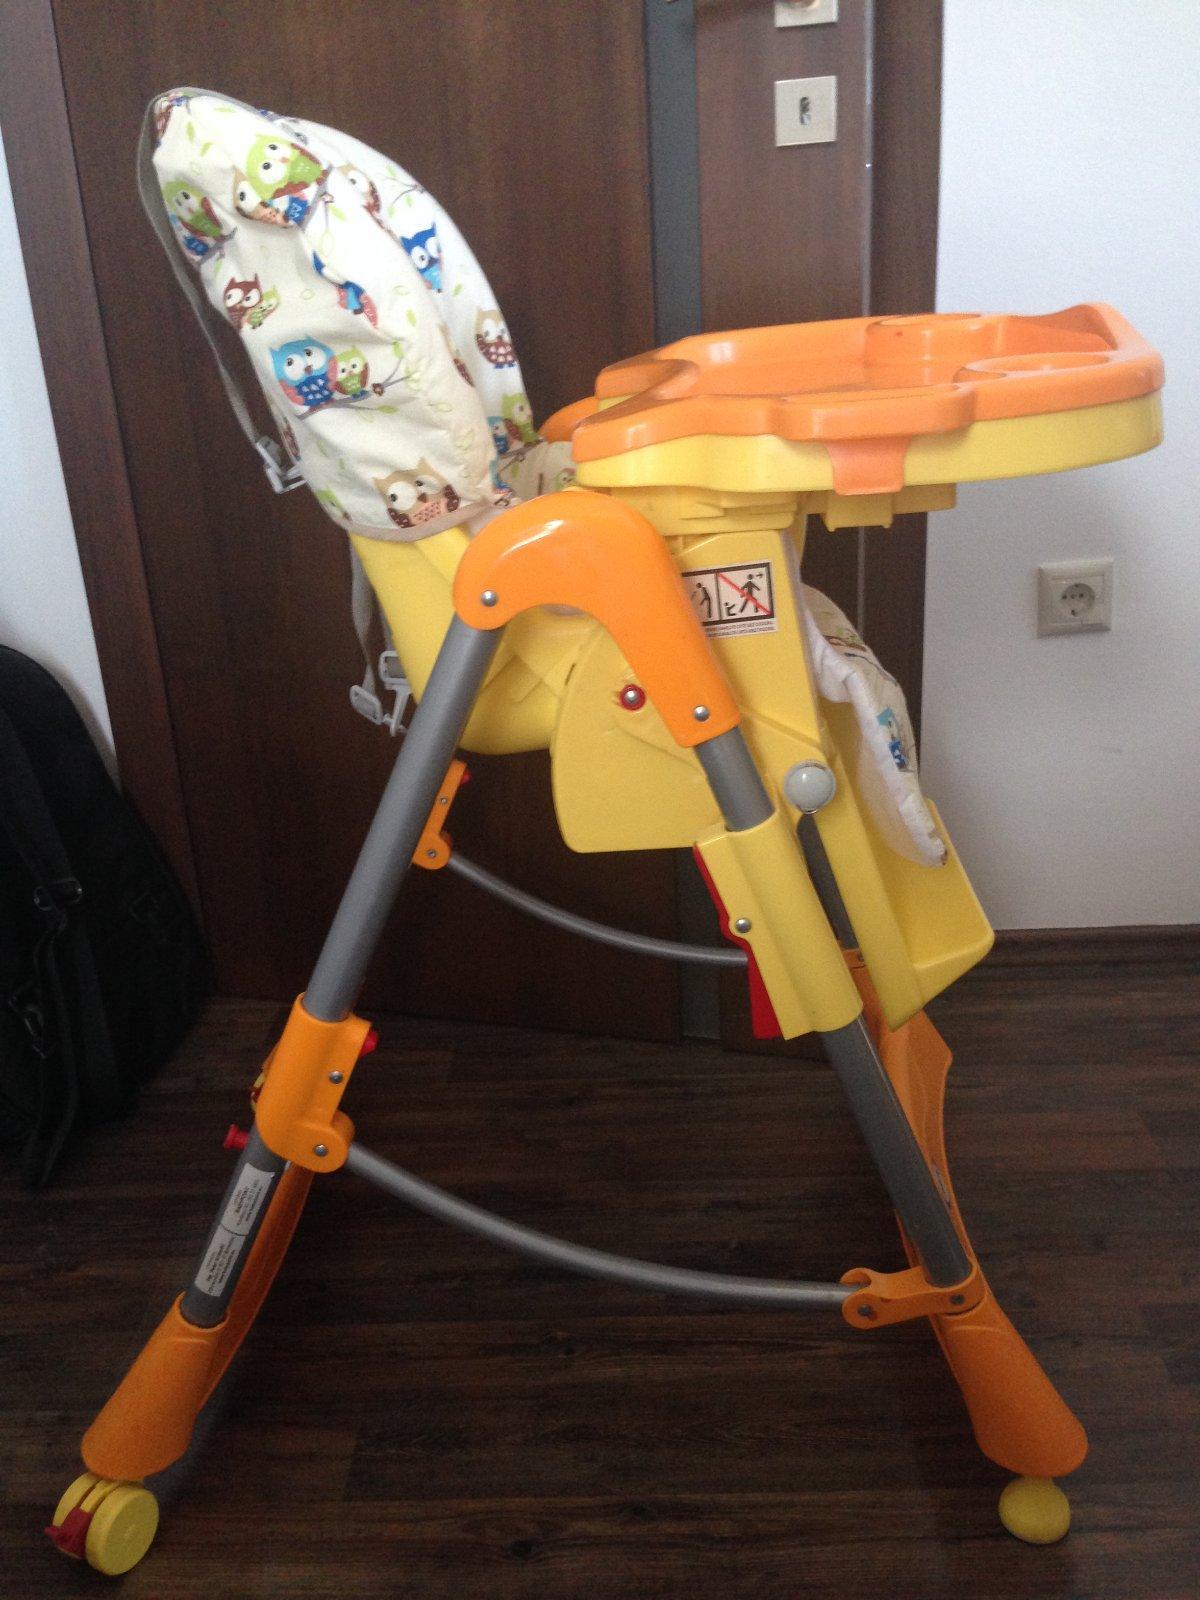 Babypoint Pinta konštrukcia a manipulacia